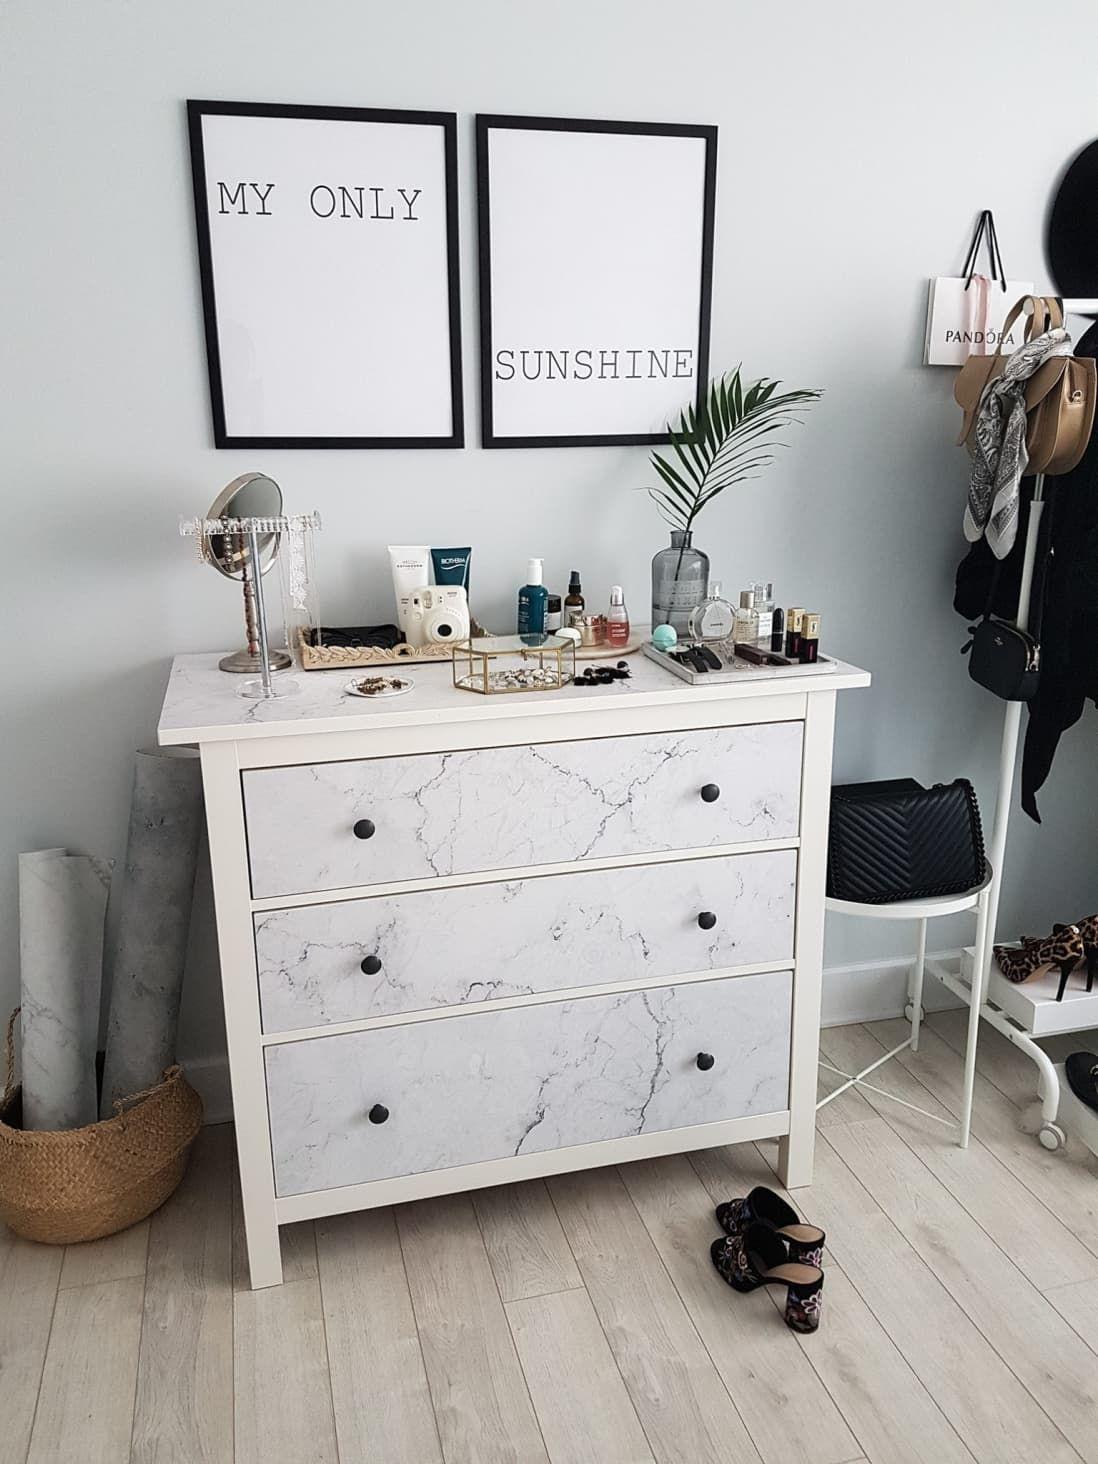 8 Fab Ikea Hacks To Make Your Hemnes Dresser Look Like A Designer Find In 2020 Apartment Decorating On A Budget Bedroom Makeover Marble Bedroom